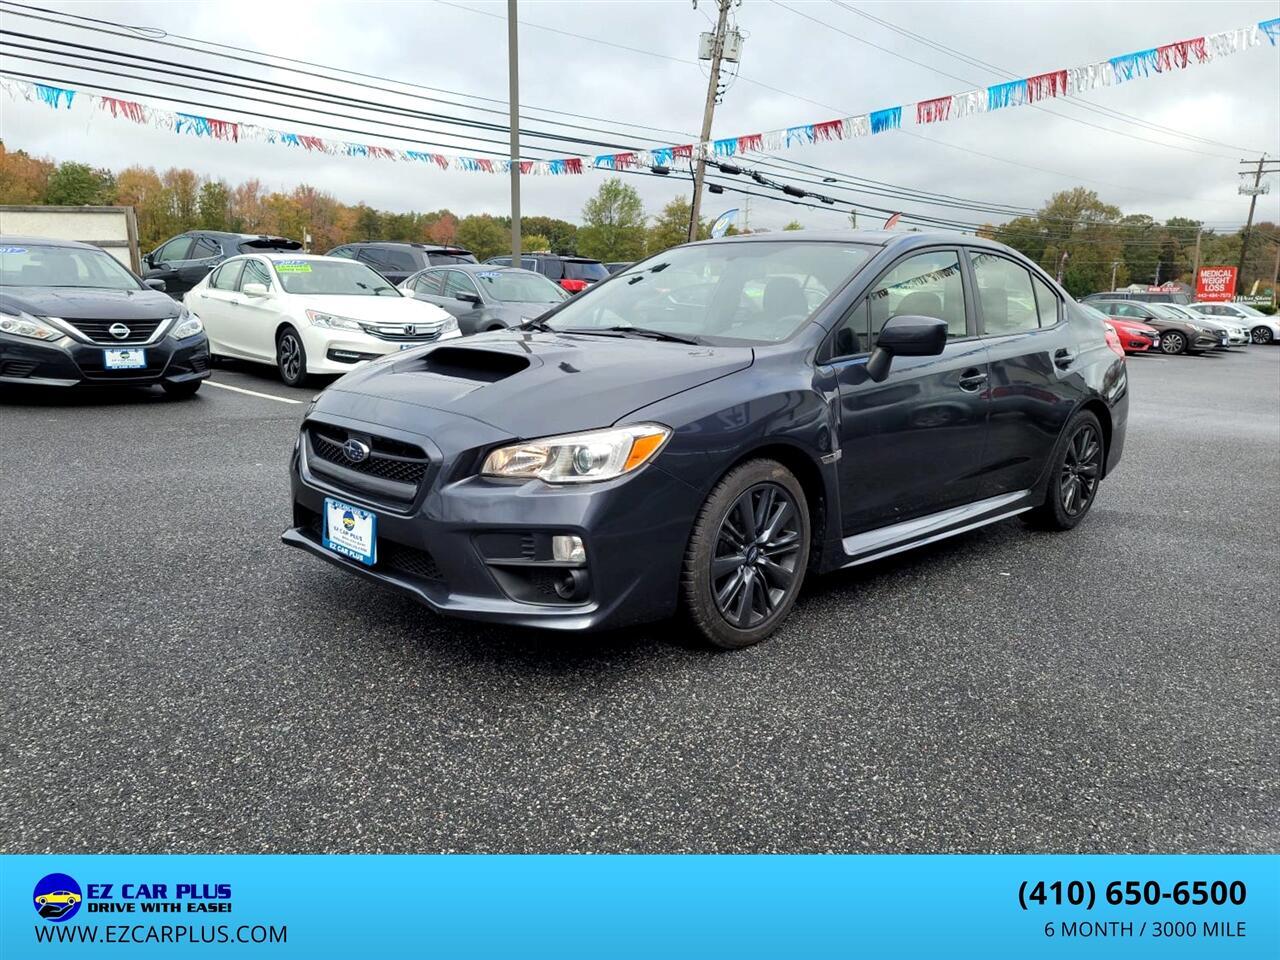 Subaru WRX 4dr Sdn Man 2015